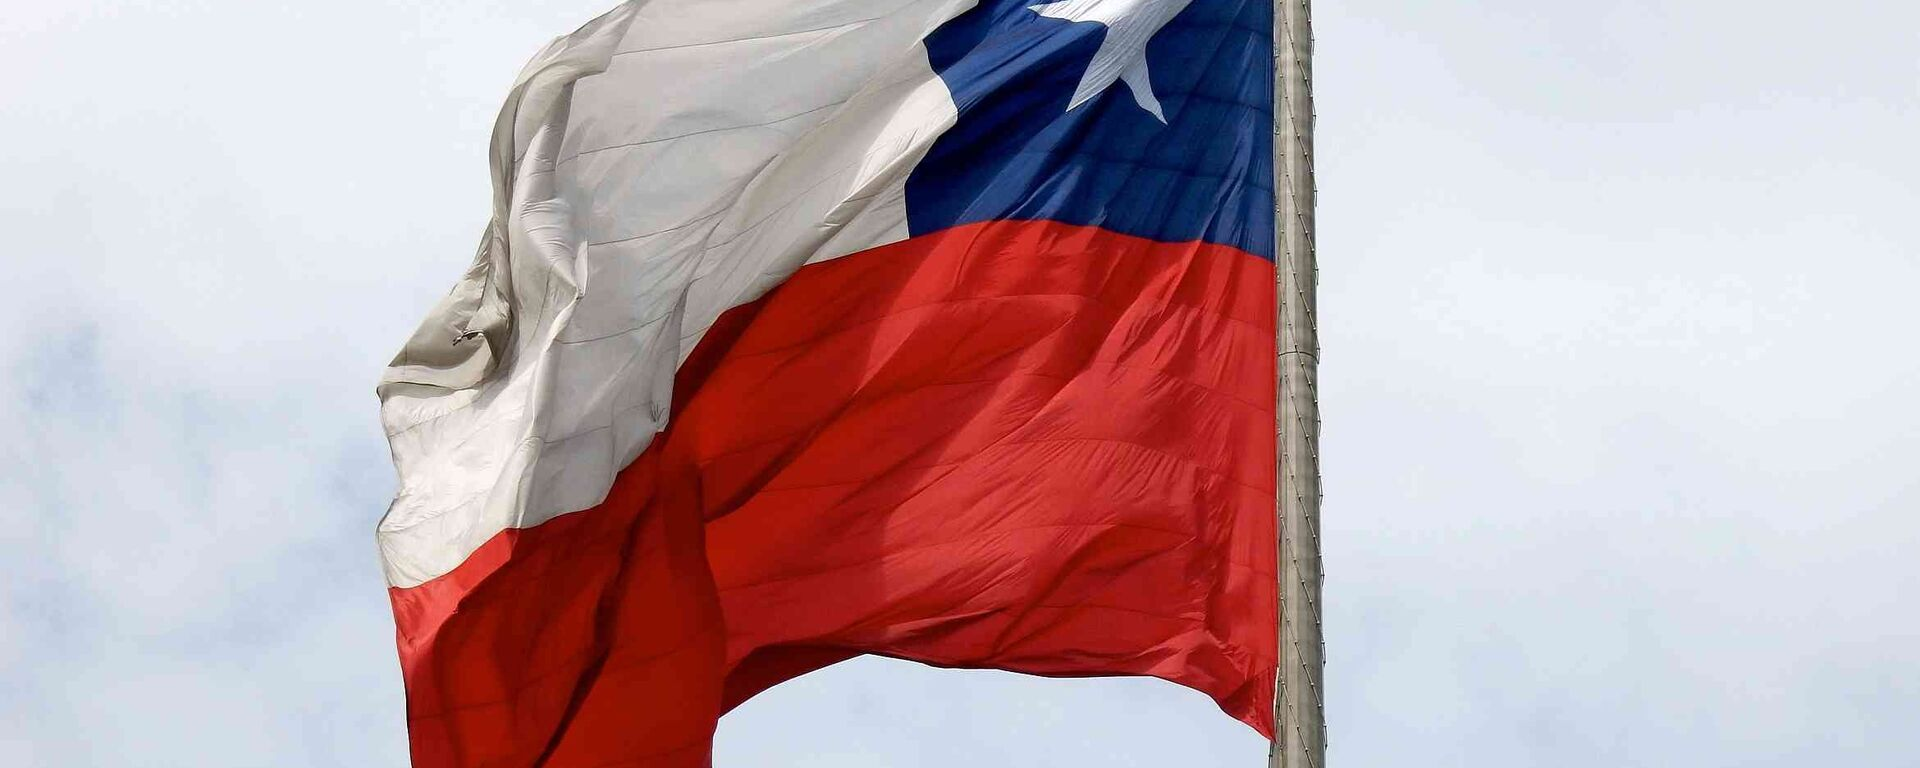 Bandera de Chile - Sputnik Mundo, 1920, 30.07.2021